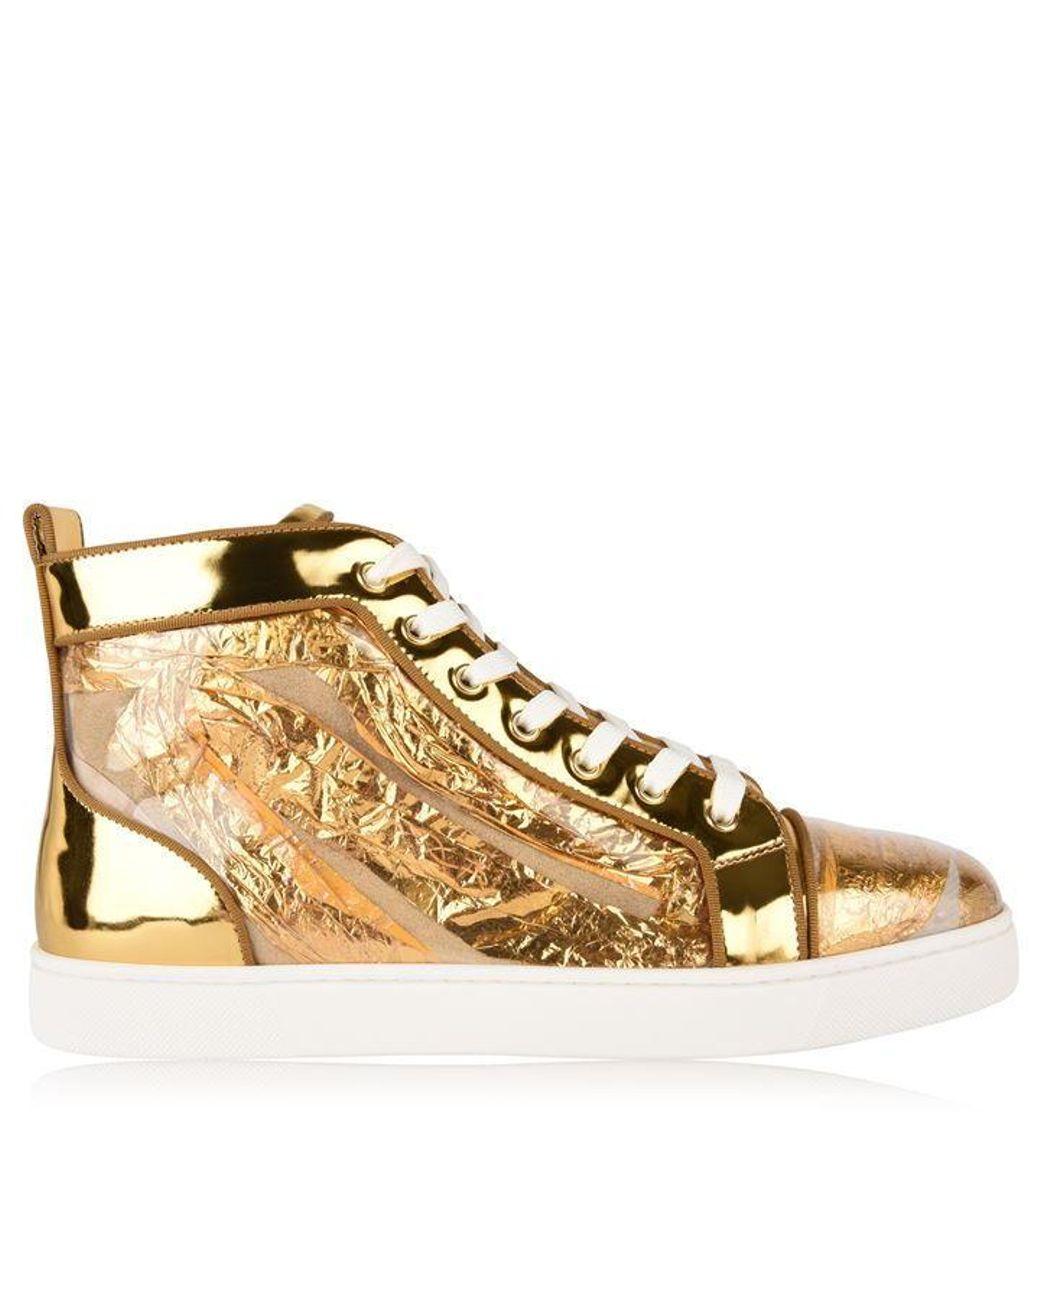 ee72d35fa16 Men's Metallic Louis Ruban High Top Sneakers